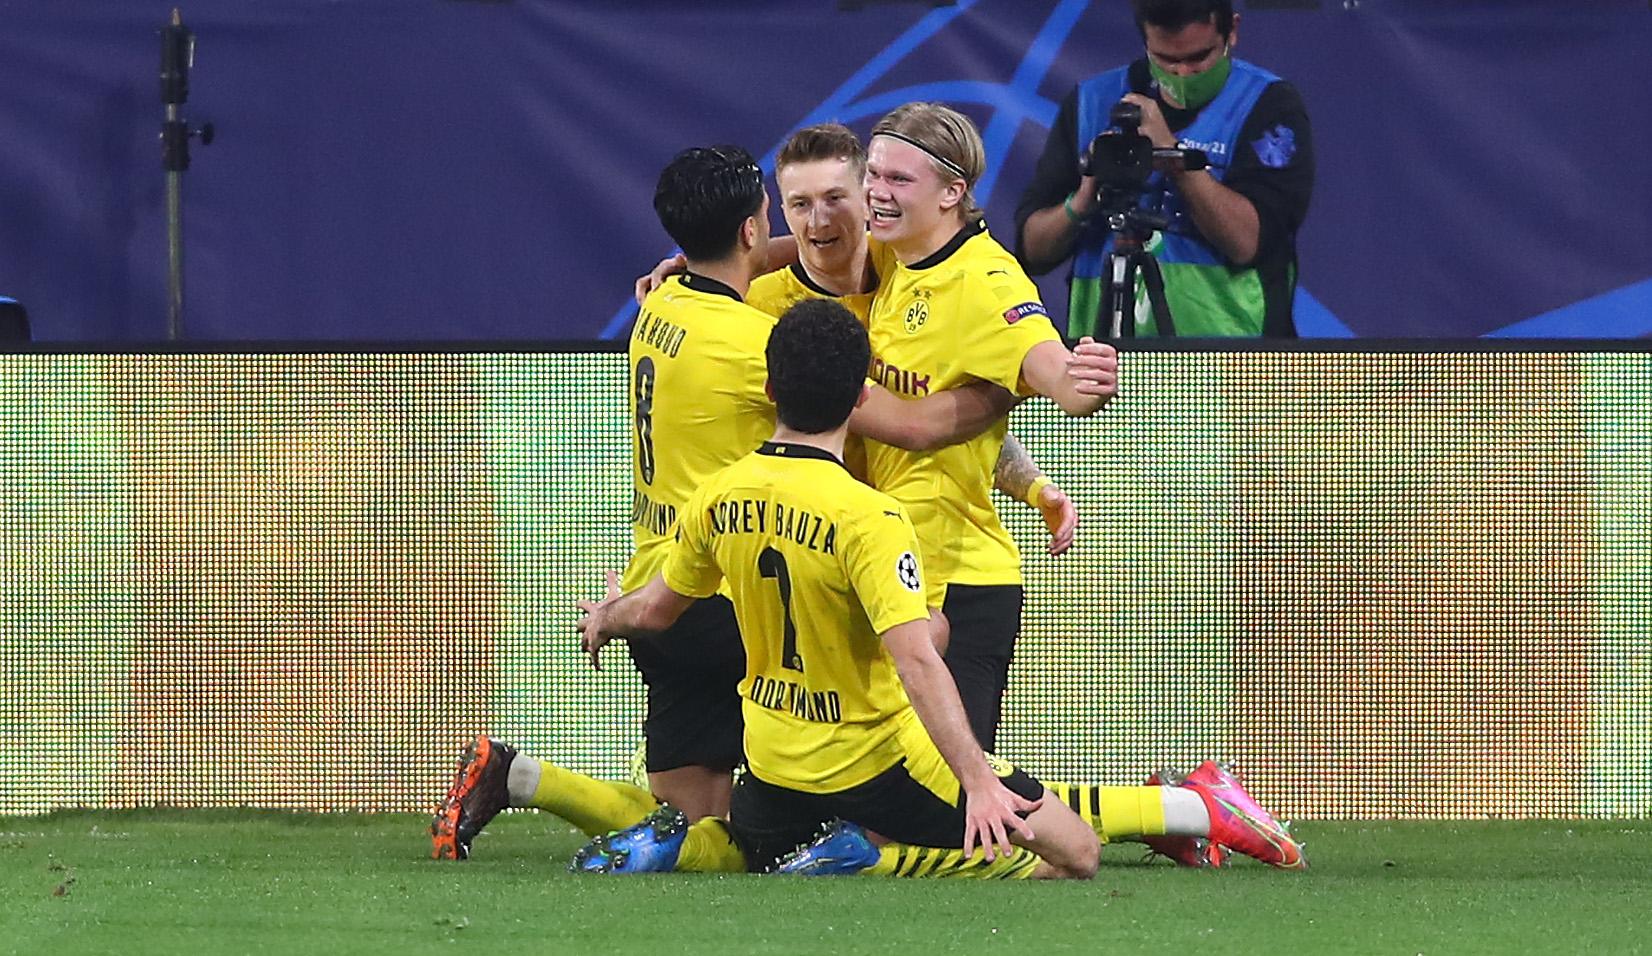 Erling Haaland nets wonderful brace as Borussia Dortmund beats Sevilla in the Champions League